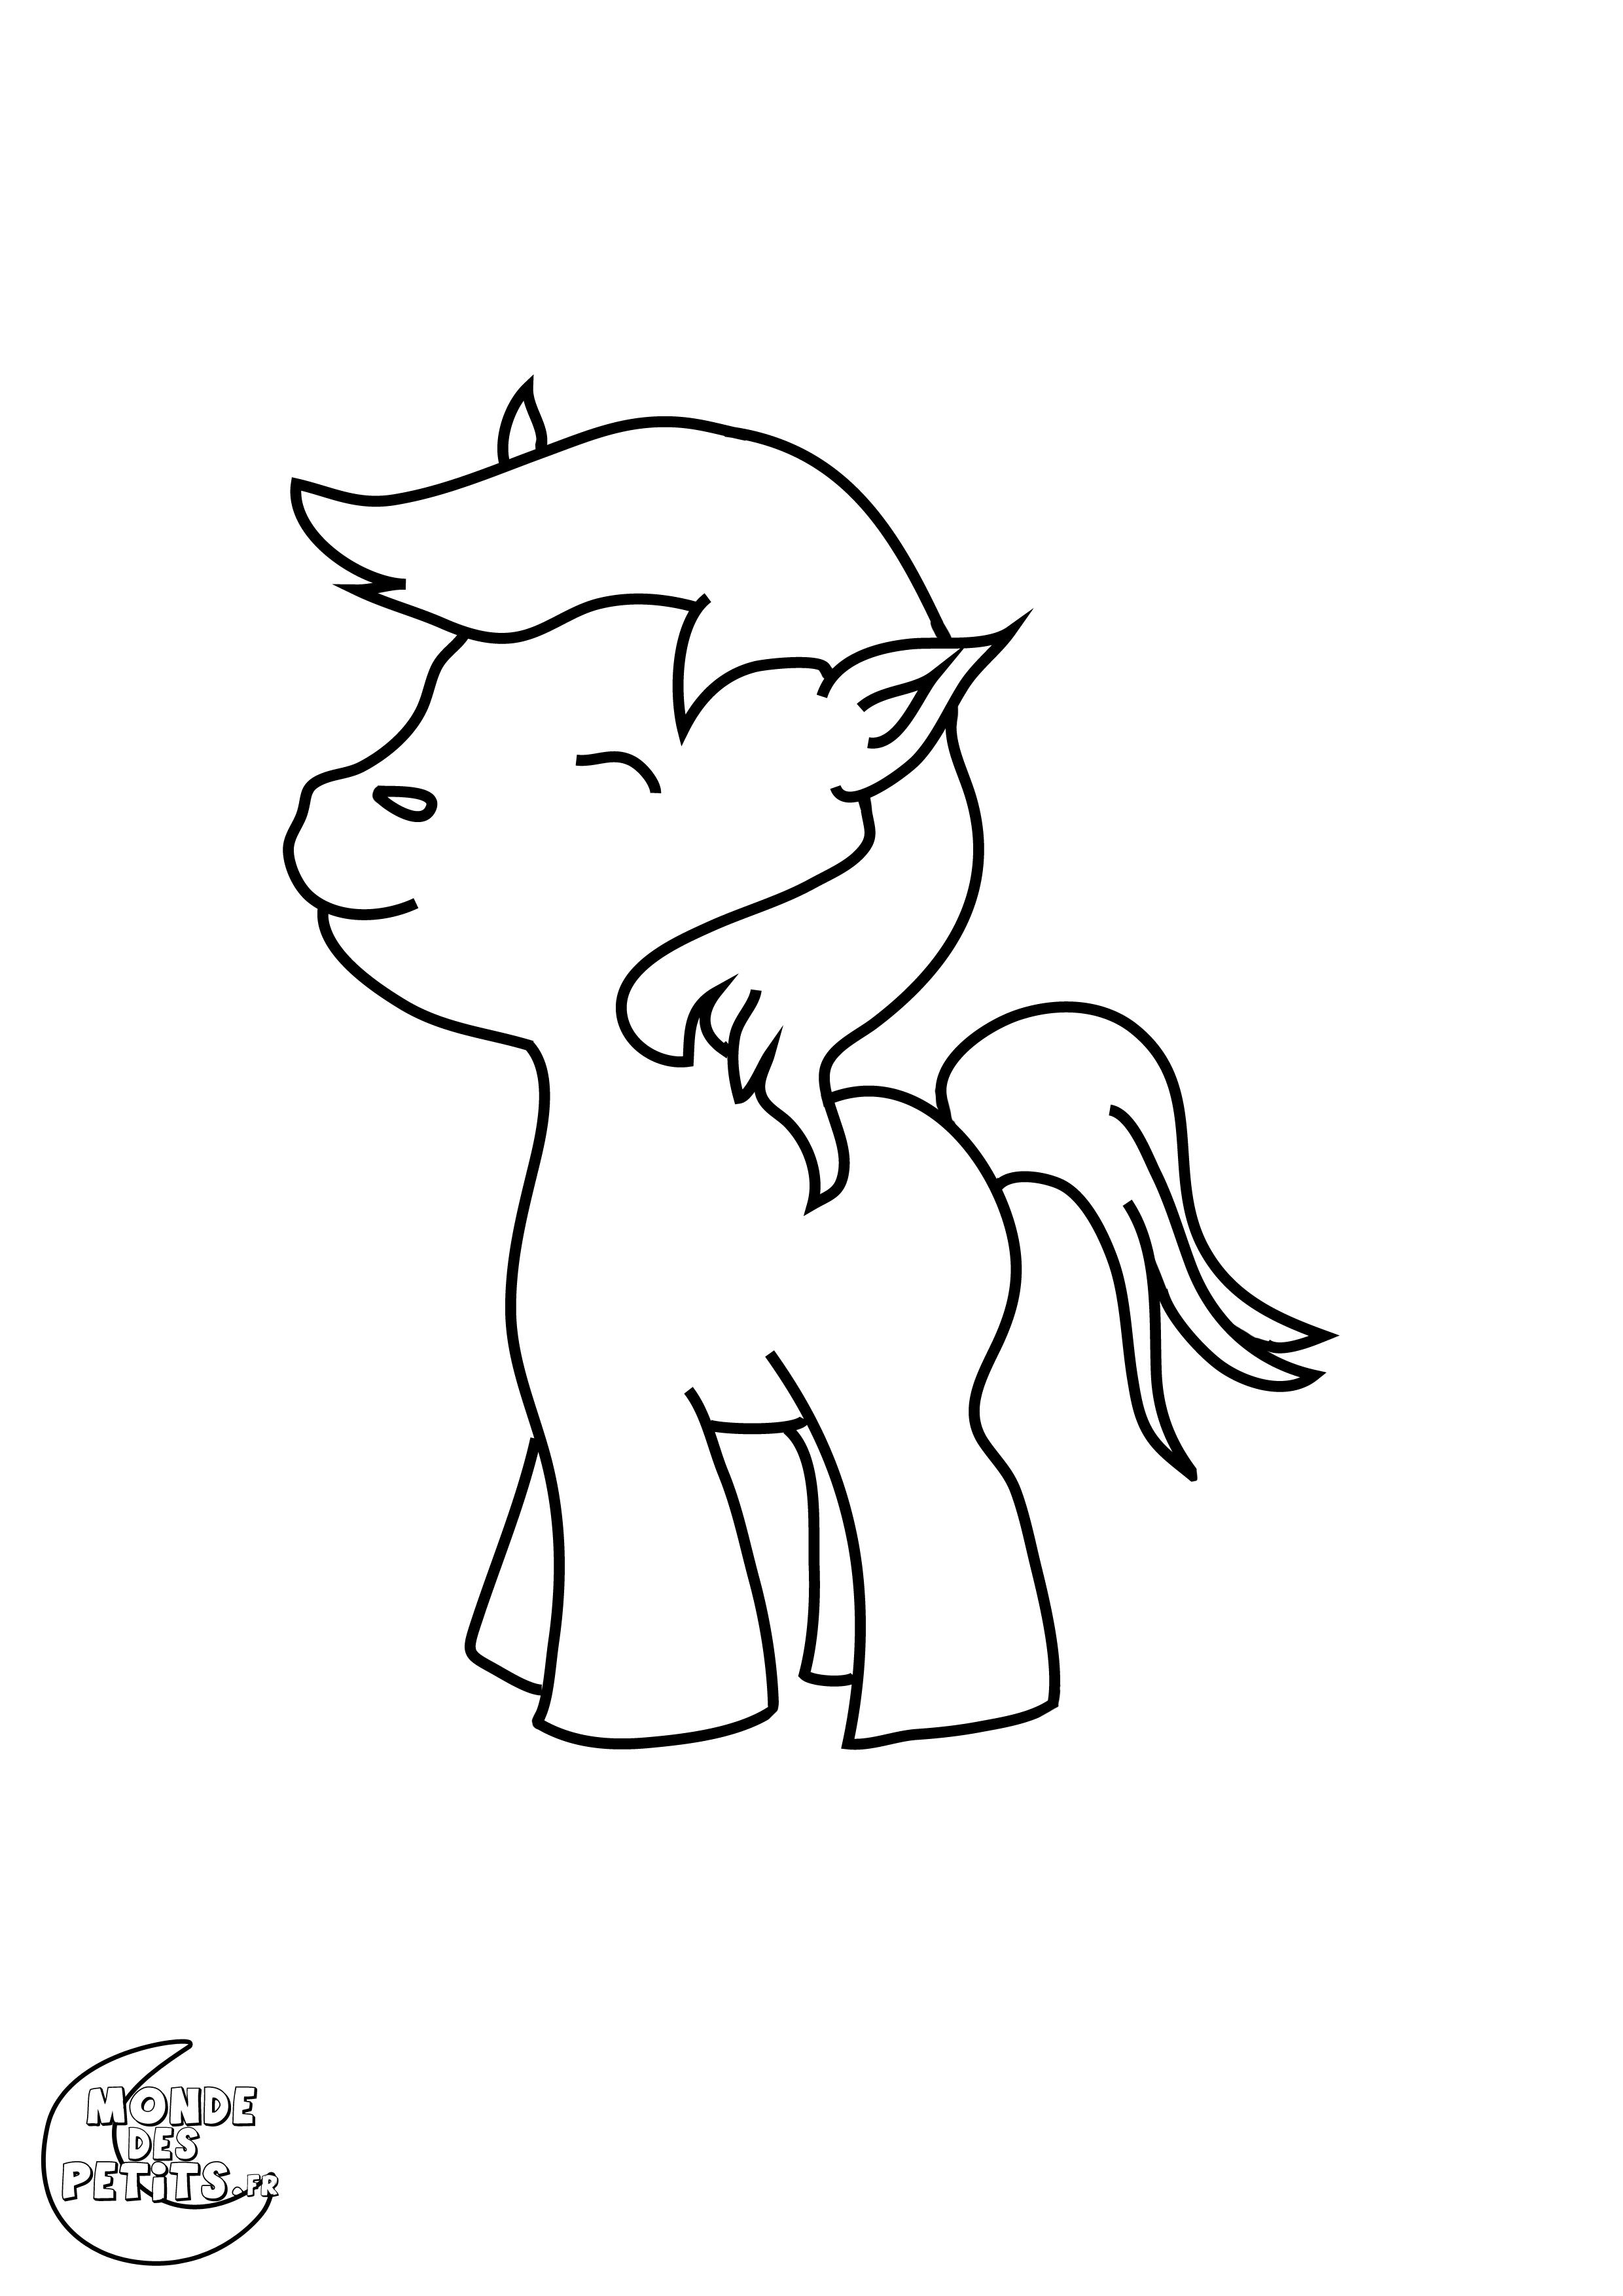 dessin simple poney